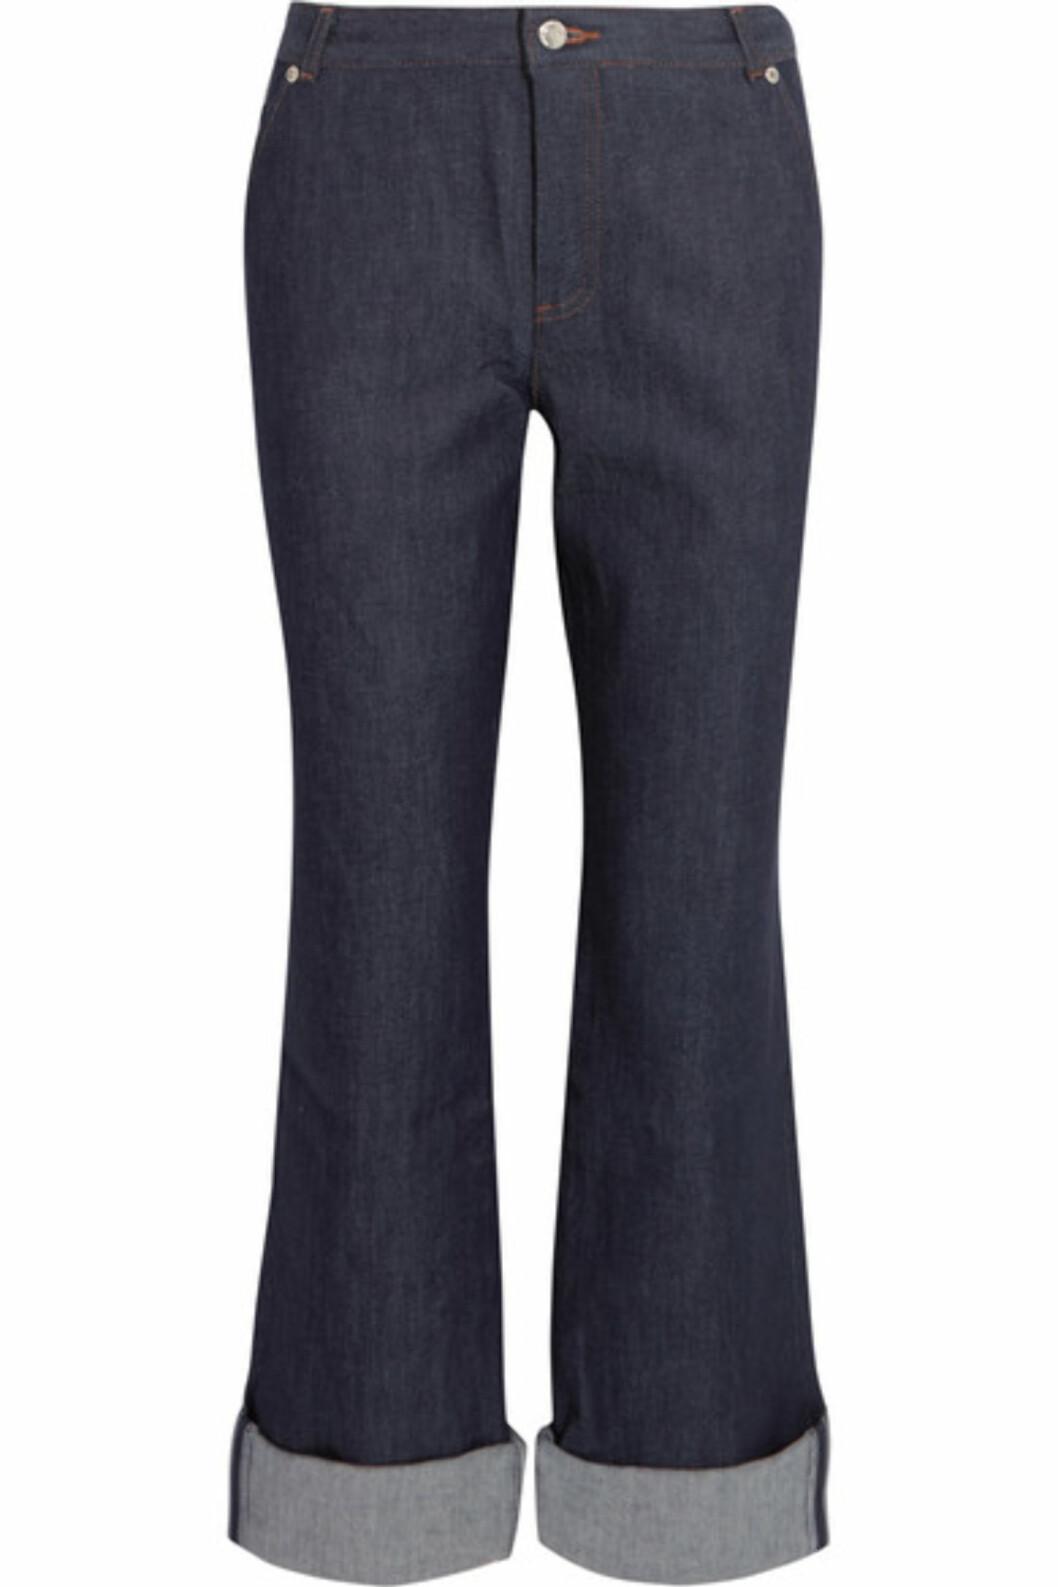 Jeans fra vanessa Seward via Net-a-porter.com | kr 2146 | https://www.net-a-porter.com/no/en/product/755651/vanessa_seward/mobile-cropped-high-rise-straight-leg-jeans